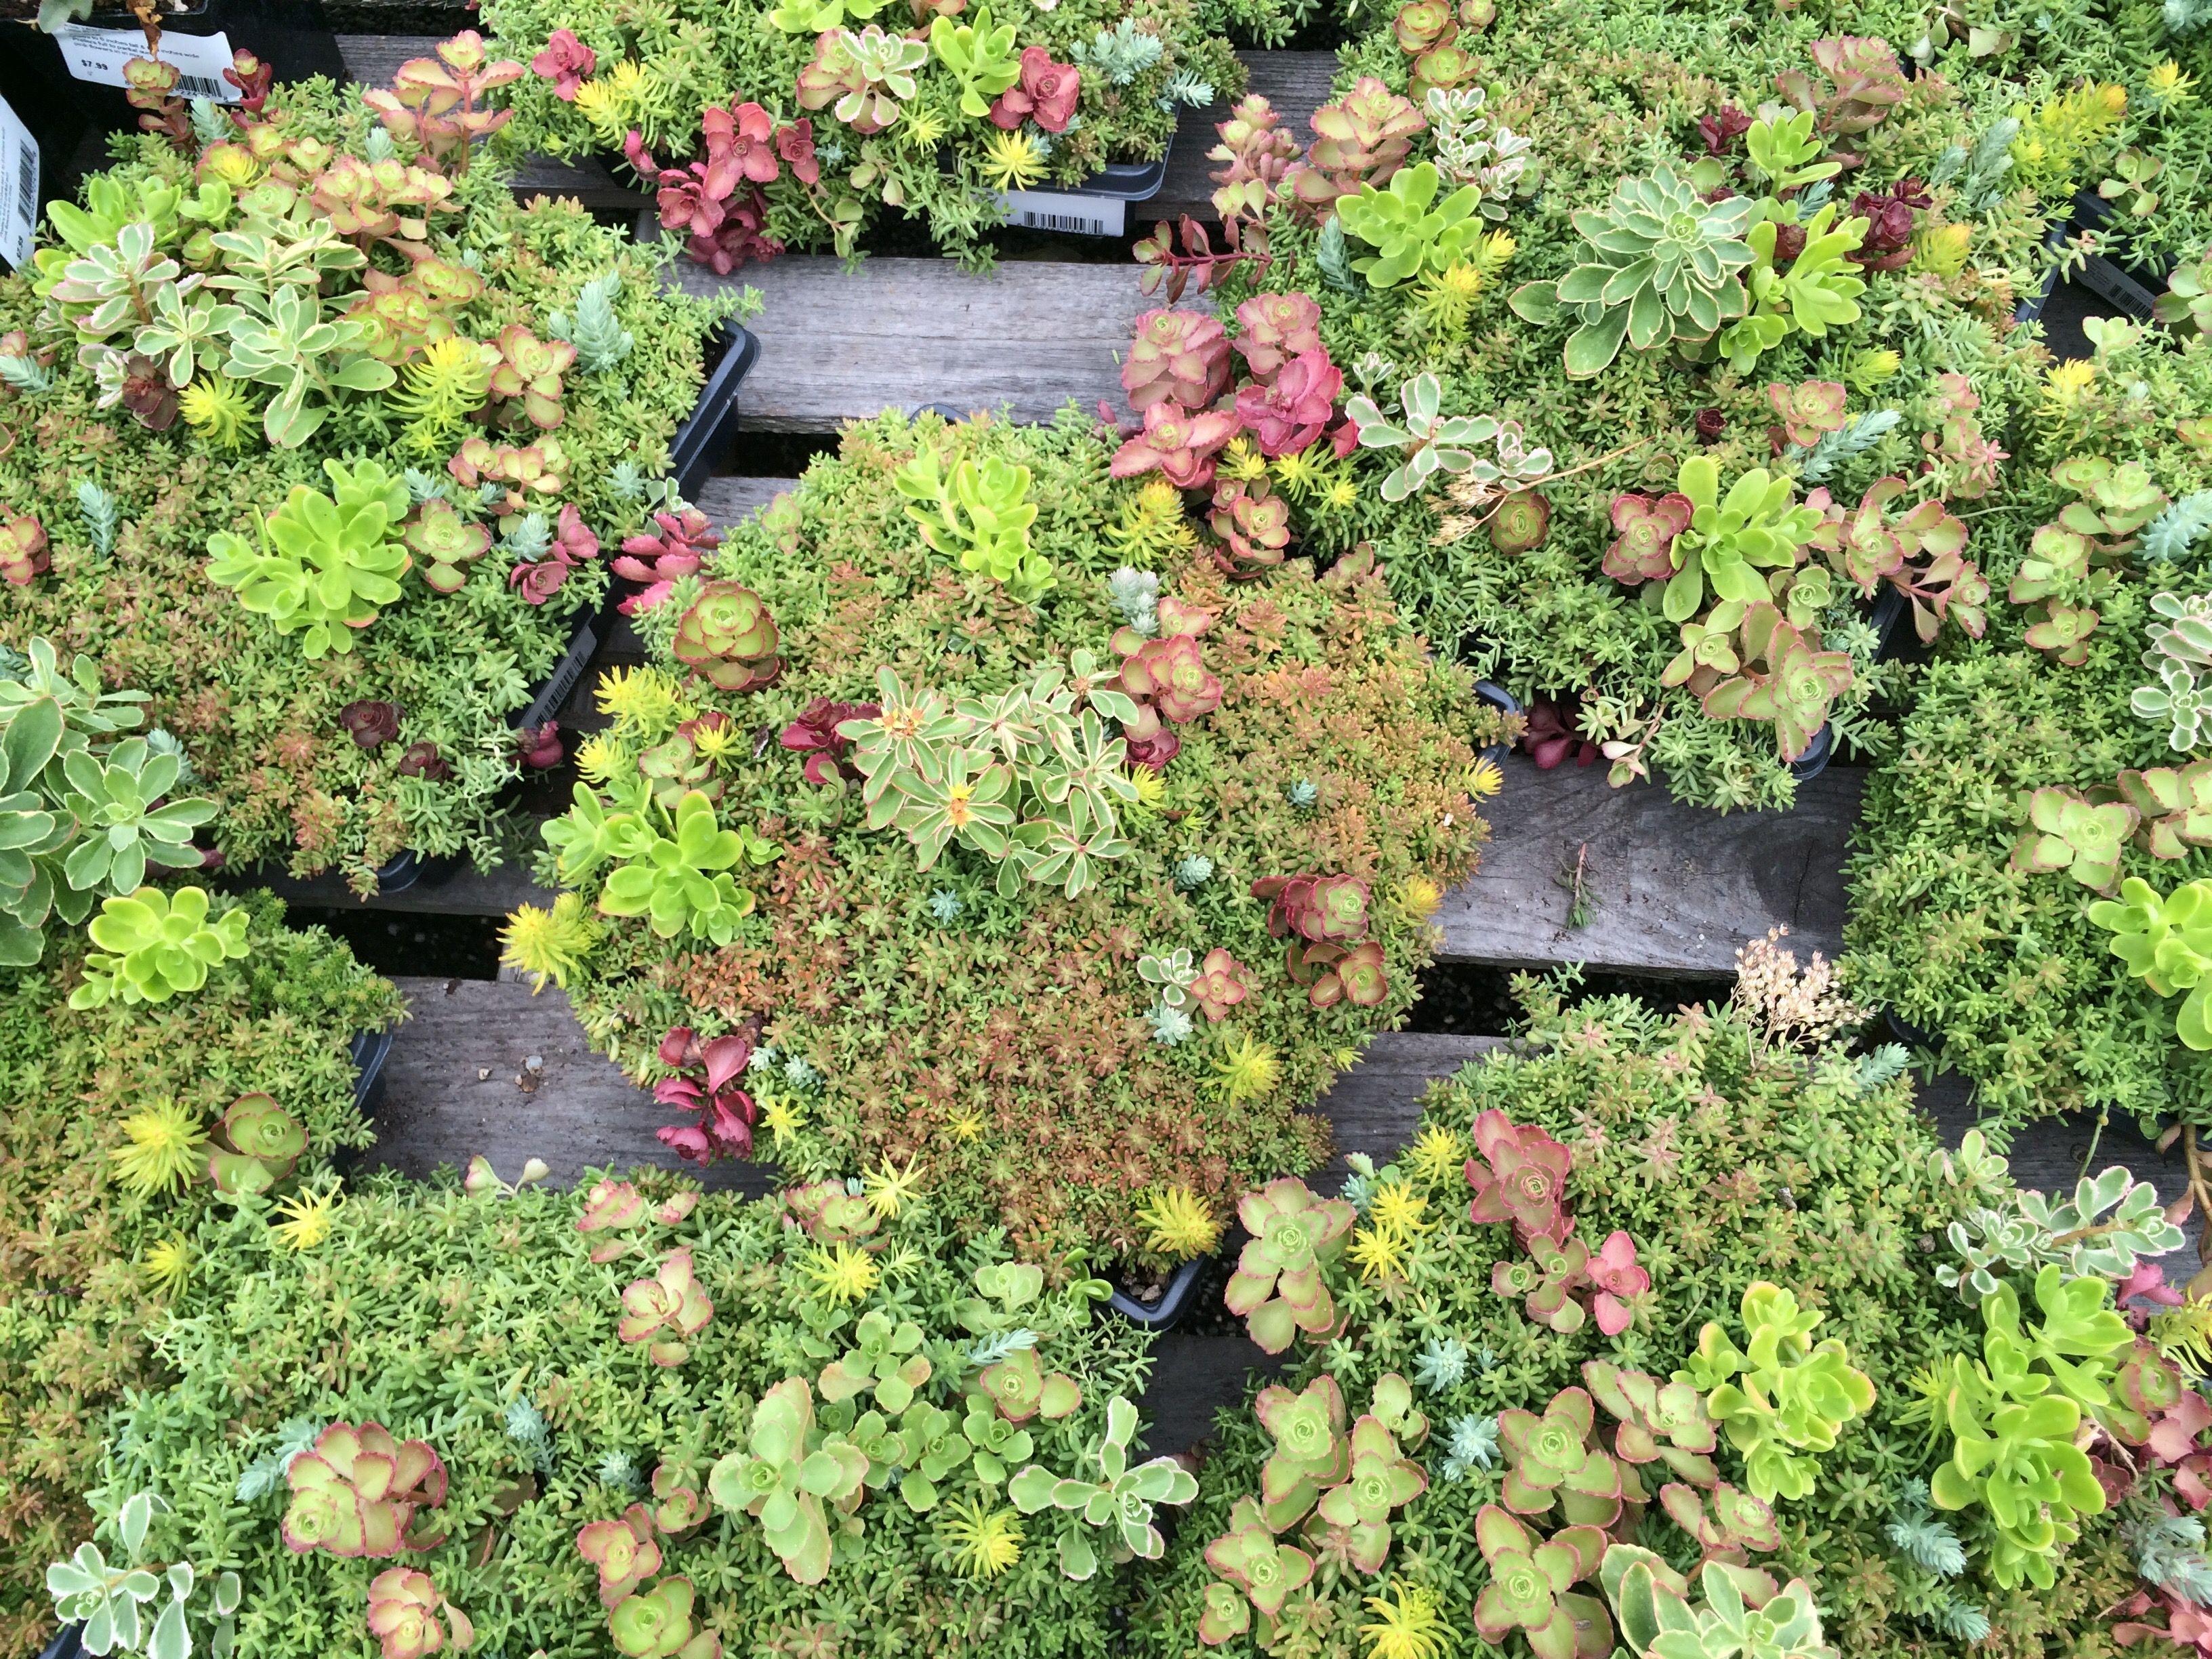 Sedum Tiles A Great Start For Anyone Interest In Vertical Gardening Garden Nursery Vertical Garden Farmington Gardens